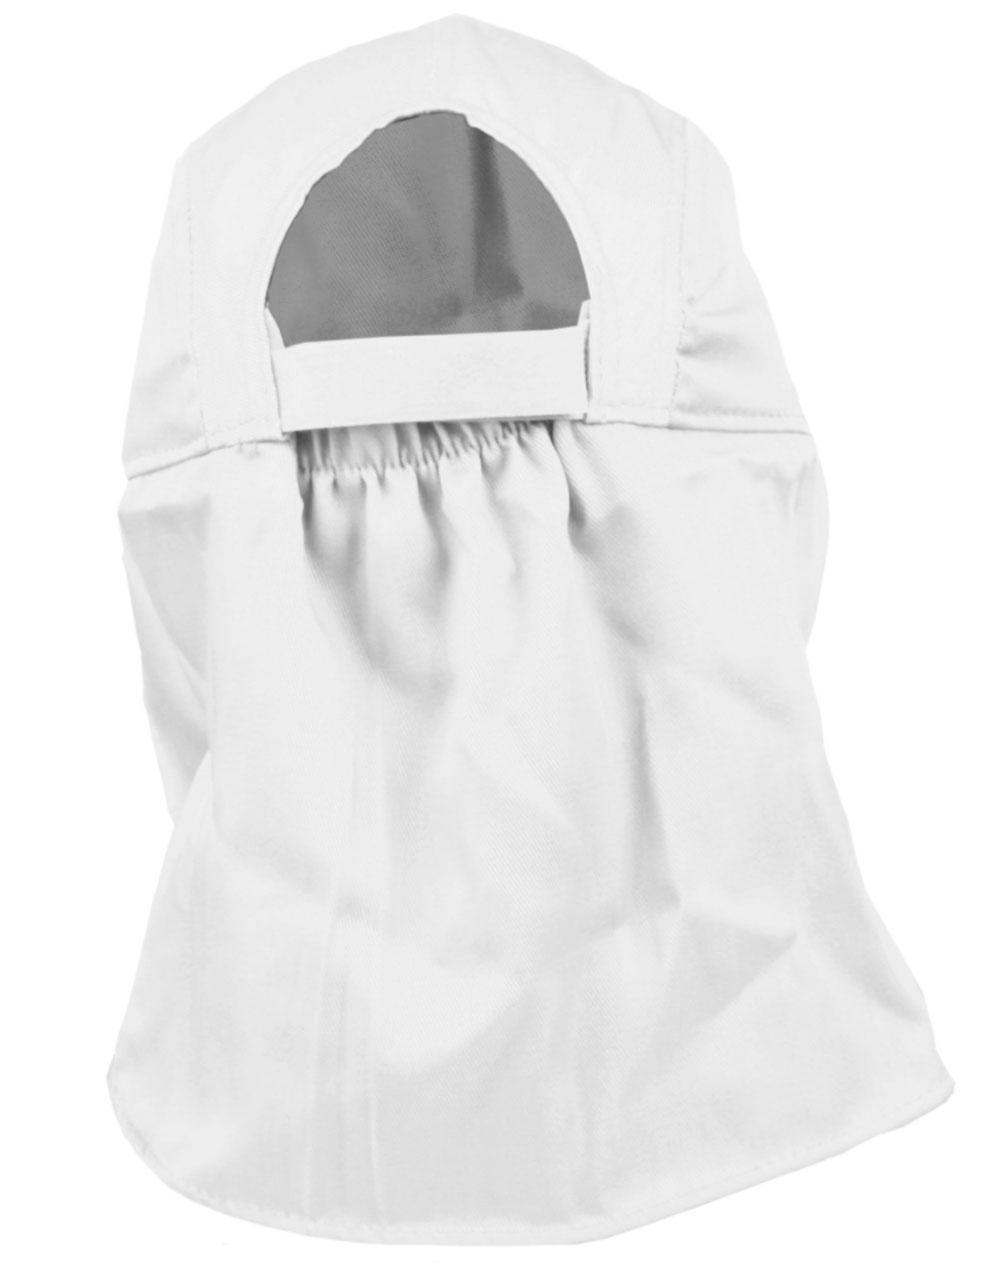 da5163e1f87 H1025 Kids Poly Cotton Legionnaire.  https   s3-ap-southeast-1.amazonaws.com  ...